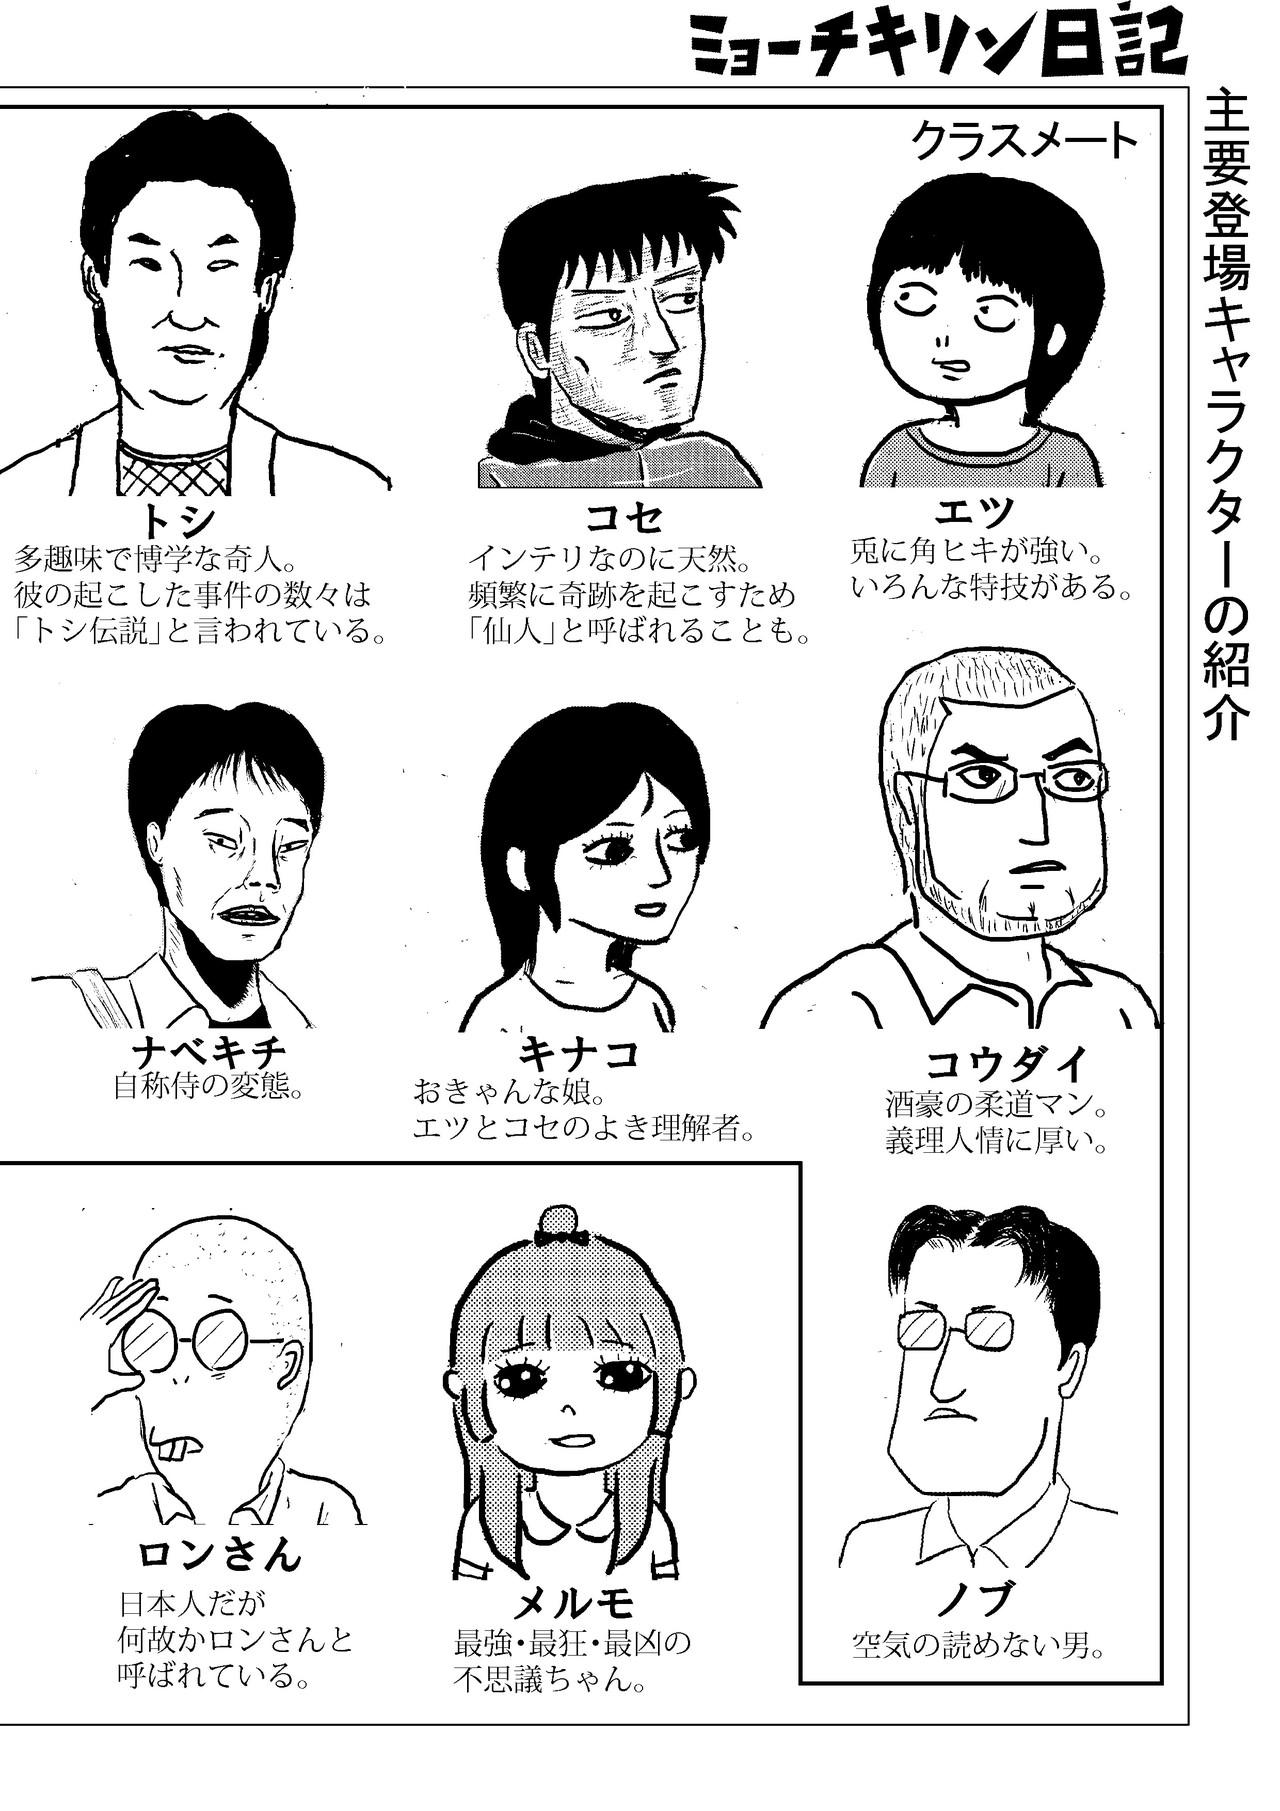 MAYBYECUCUMBERSのコミックエッセイ「ミョーチキリン日記」に登場する主要人物を簡単にまとめました。随時、加筆・変更します。 作:ETSU・KOSSE